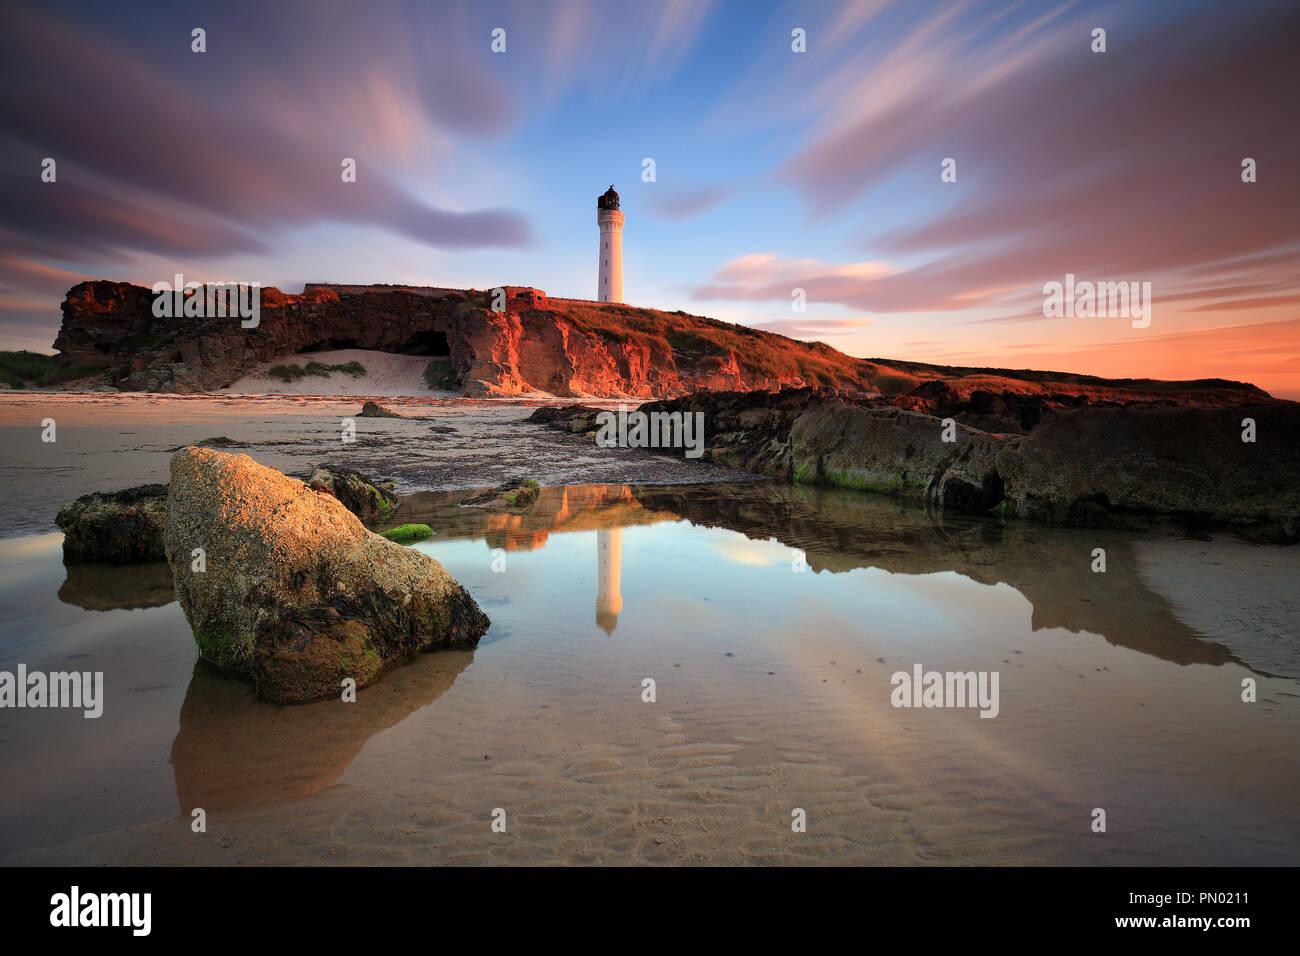 Amazing sunset over Lossiemouth lighthouse (Scotland, UK) - Stock Image